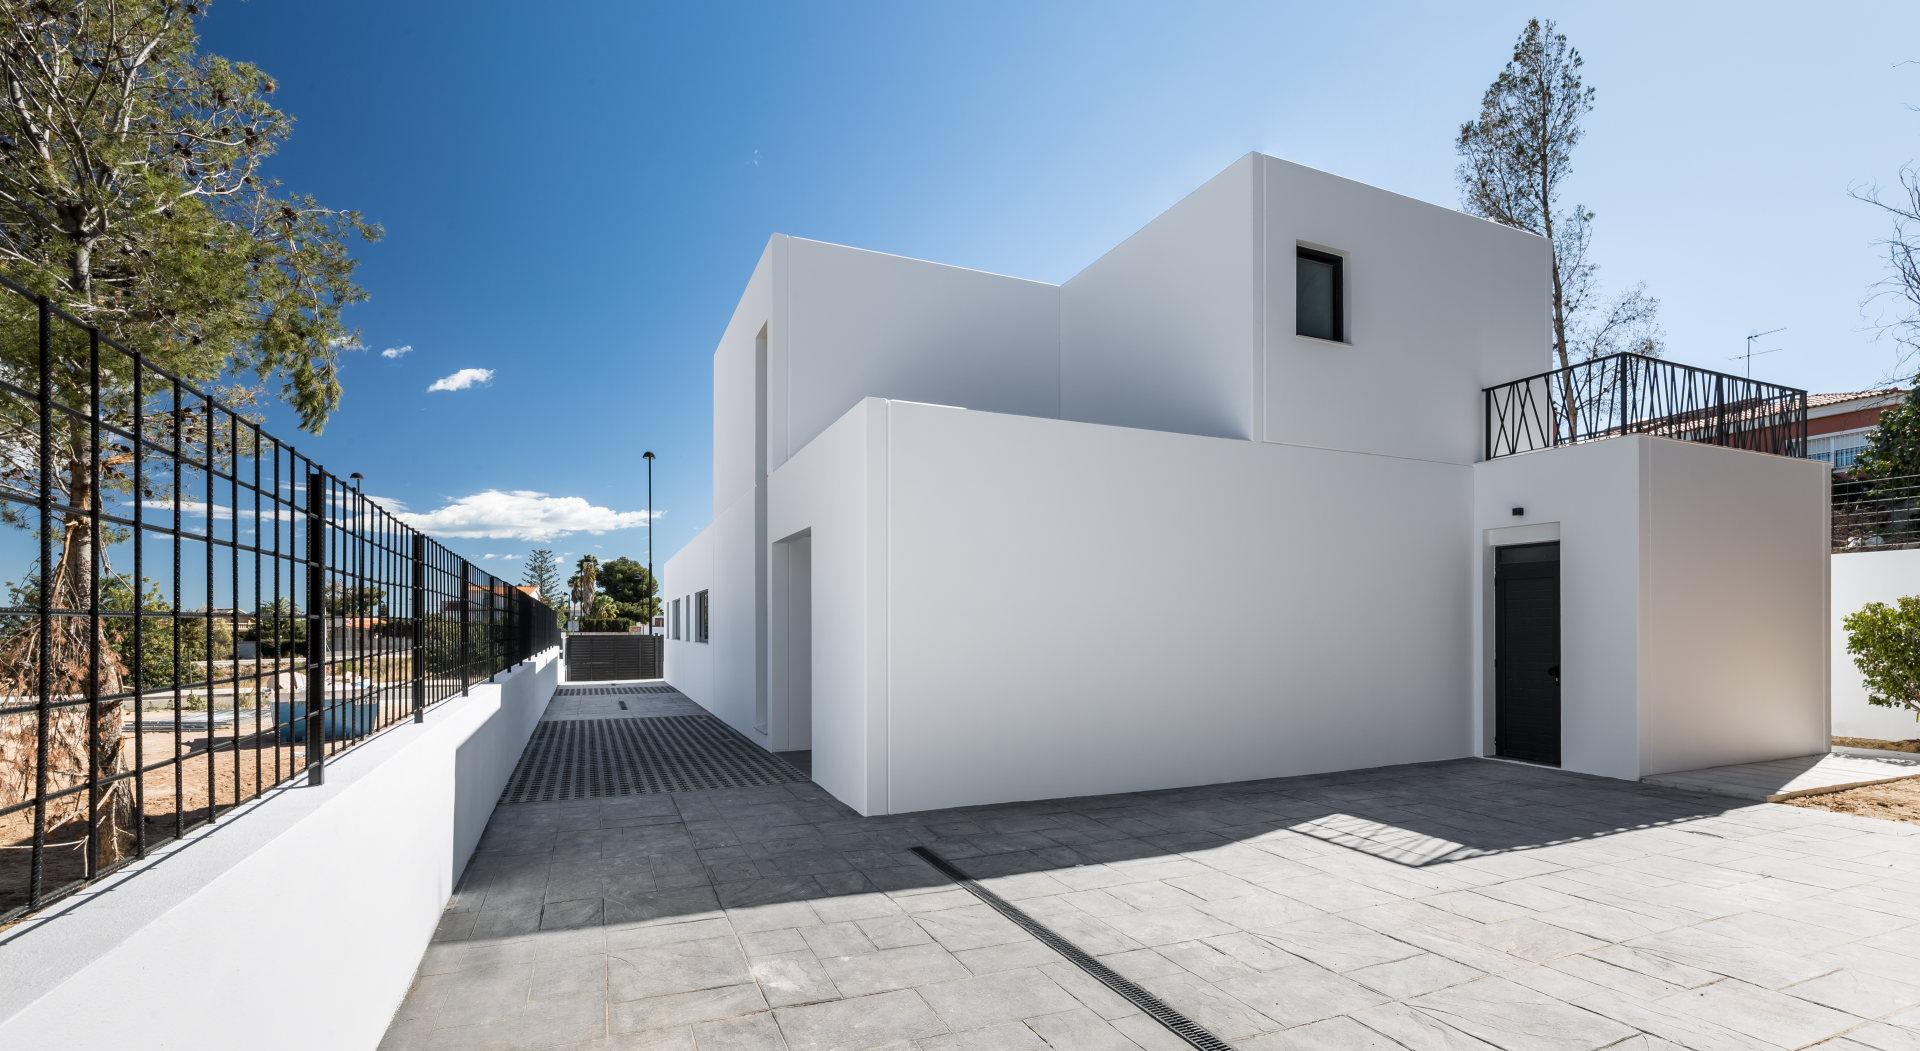 fotografia-arquitectura-valencia-german-cabo-viraje-el-vedat-torrent (10)